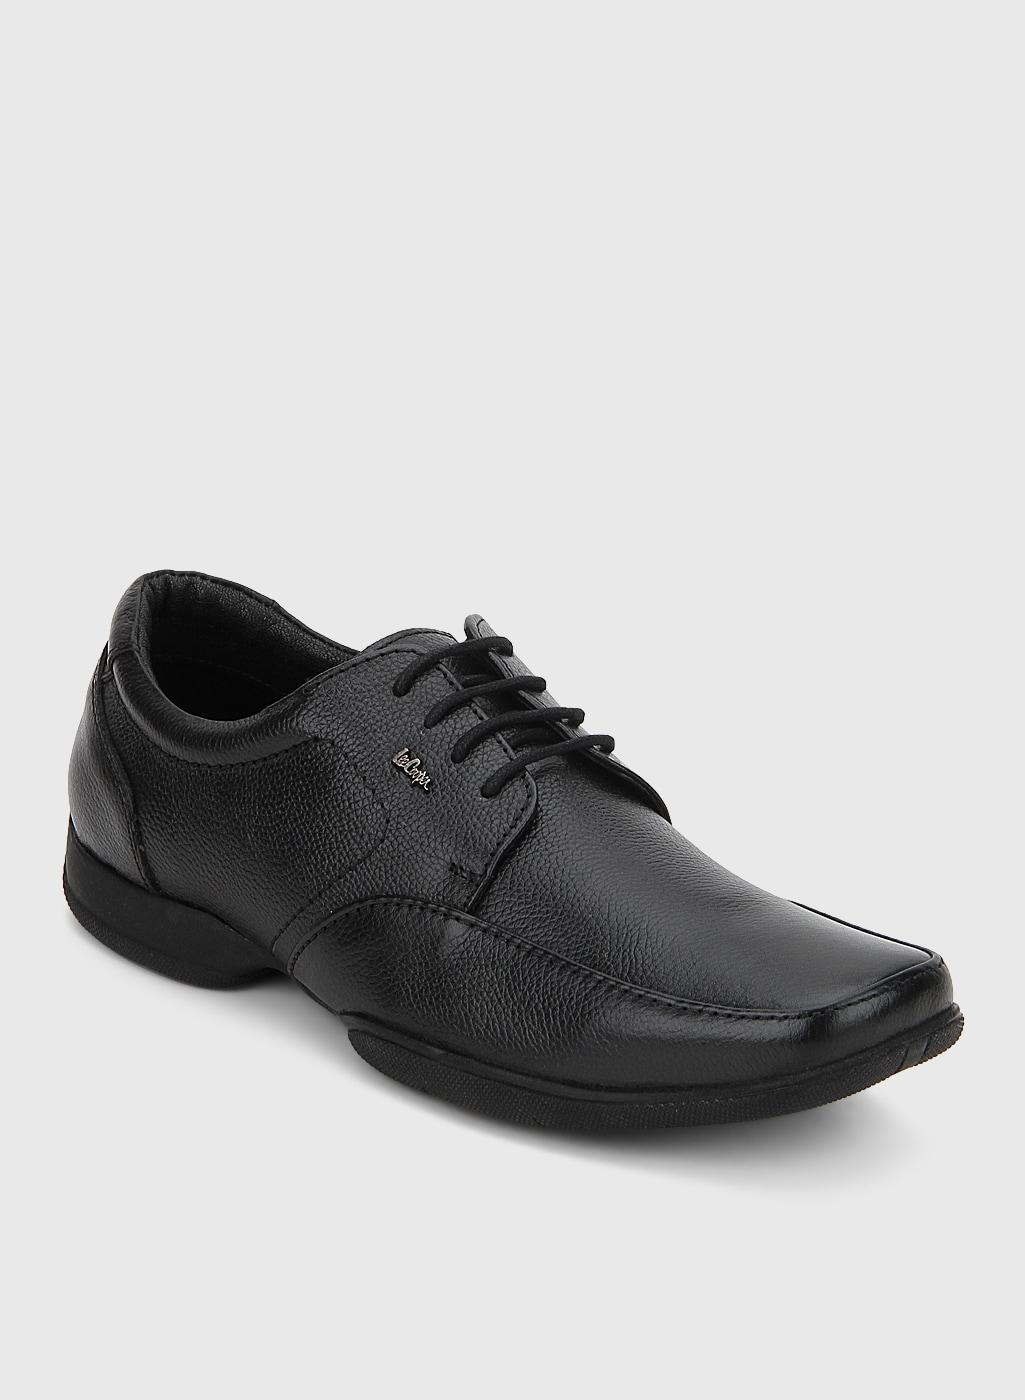 bcbb2fb68bc Lee Cooper Black Oxford Brogue Formal Shoes for Men online in India ...